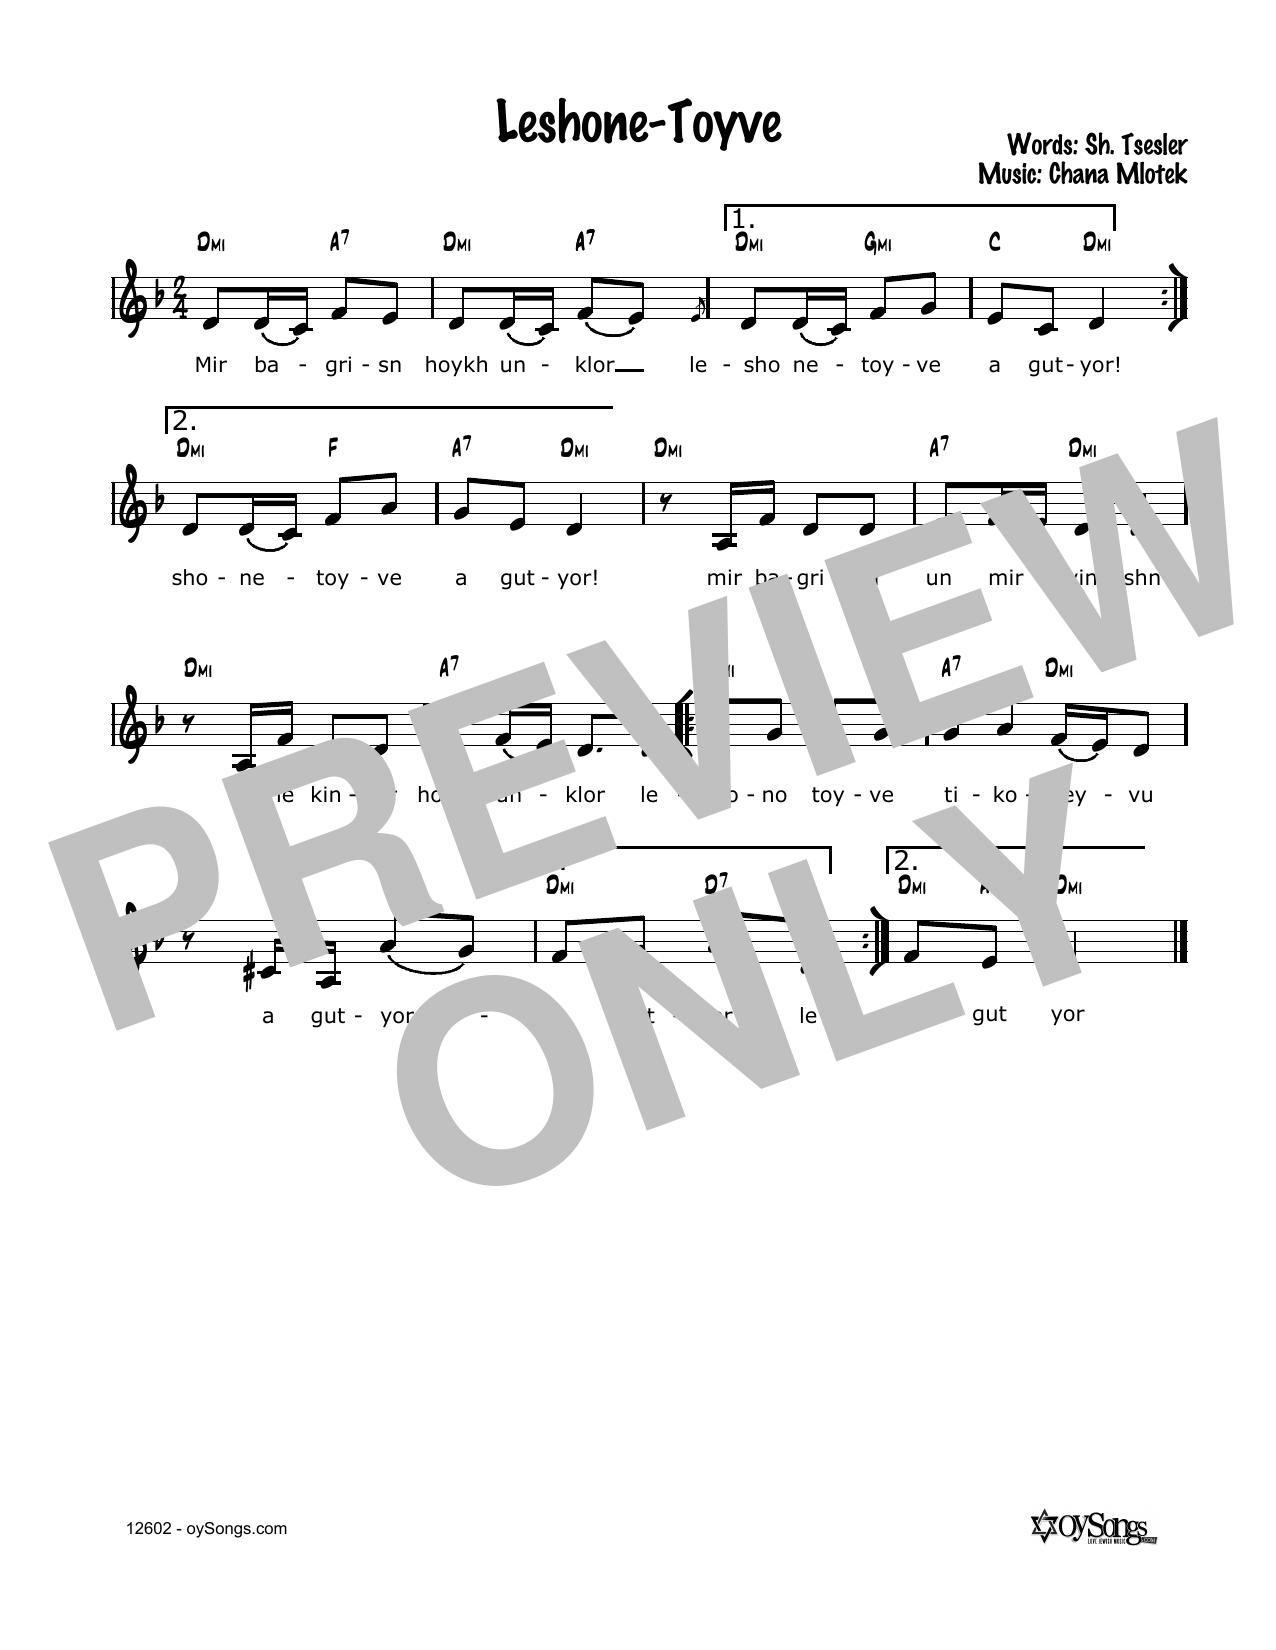 Cindy Paley Leshono-Toyvo sheet music notes and chords. Download Printable PDF.